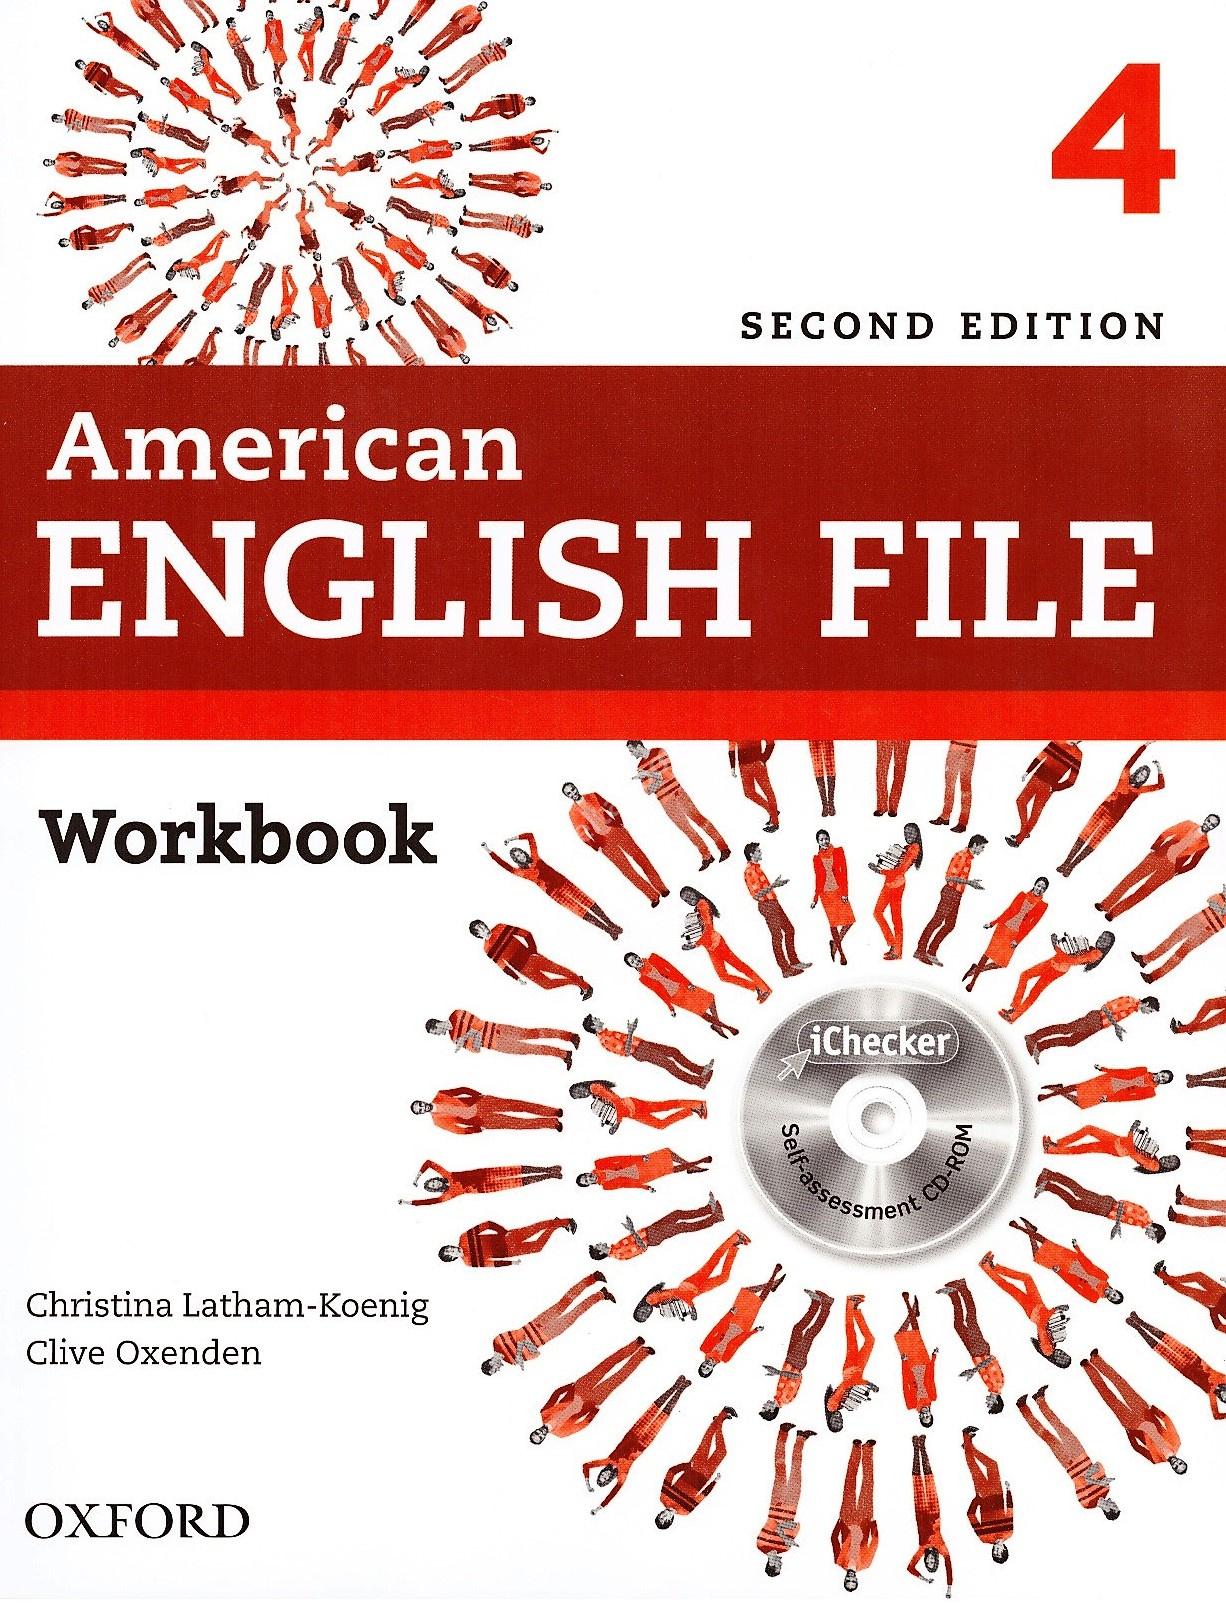 American English File 4 Workbook: with iChecker